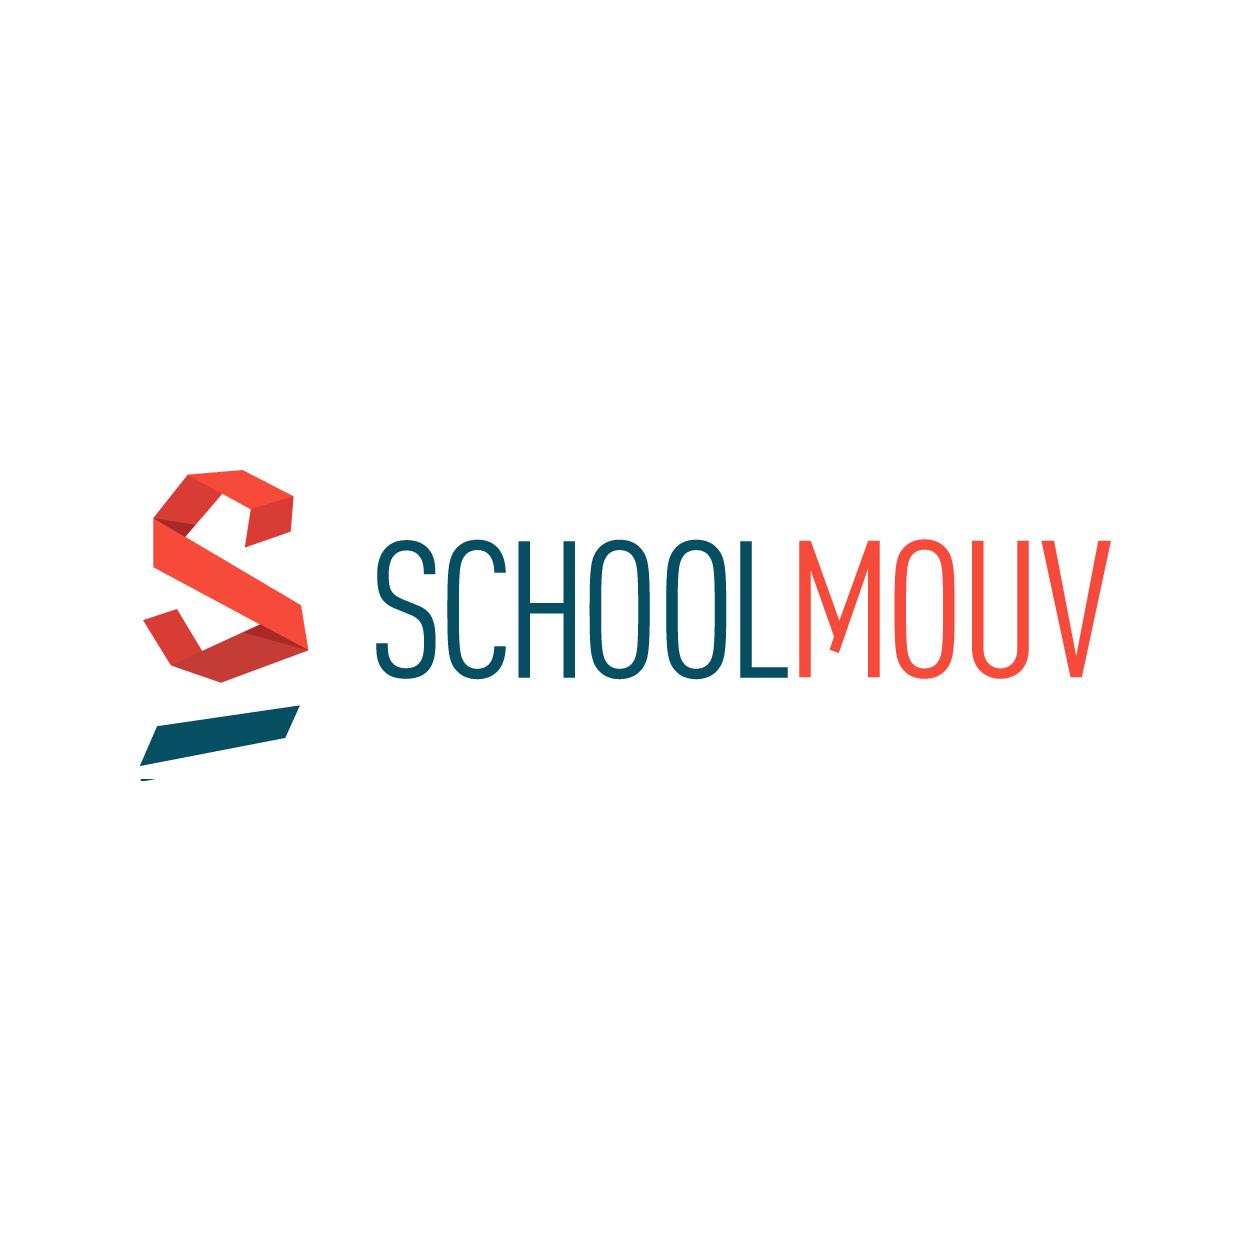 Schoolmouv